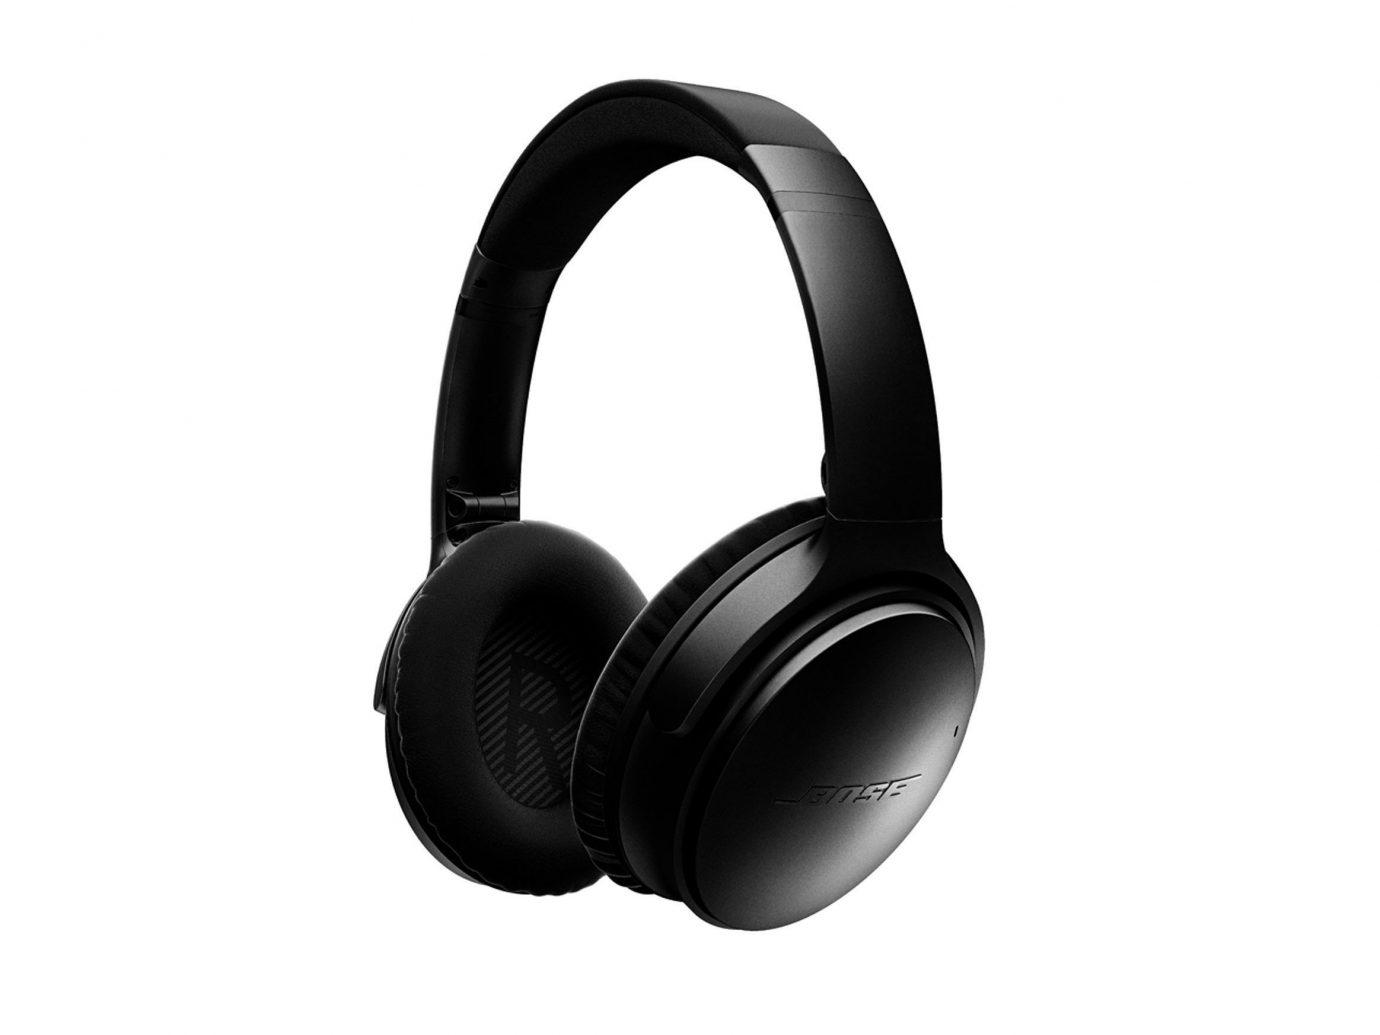 Travel Tips electronics earphone headphones gadget technology electronic device audio equipment headset communication device ear audio